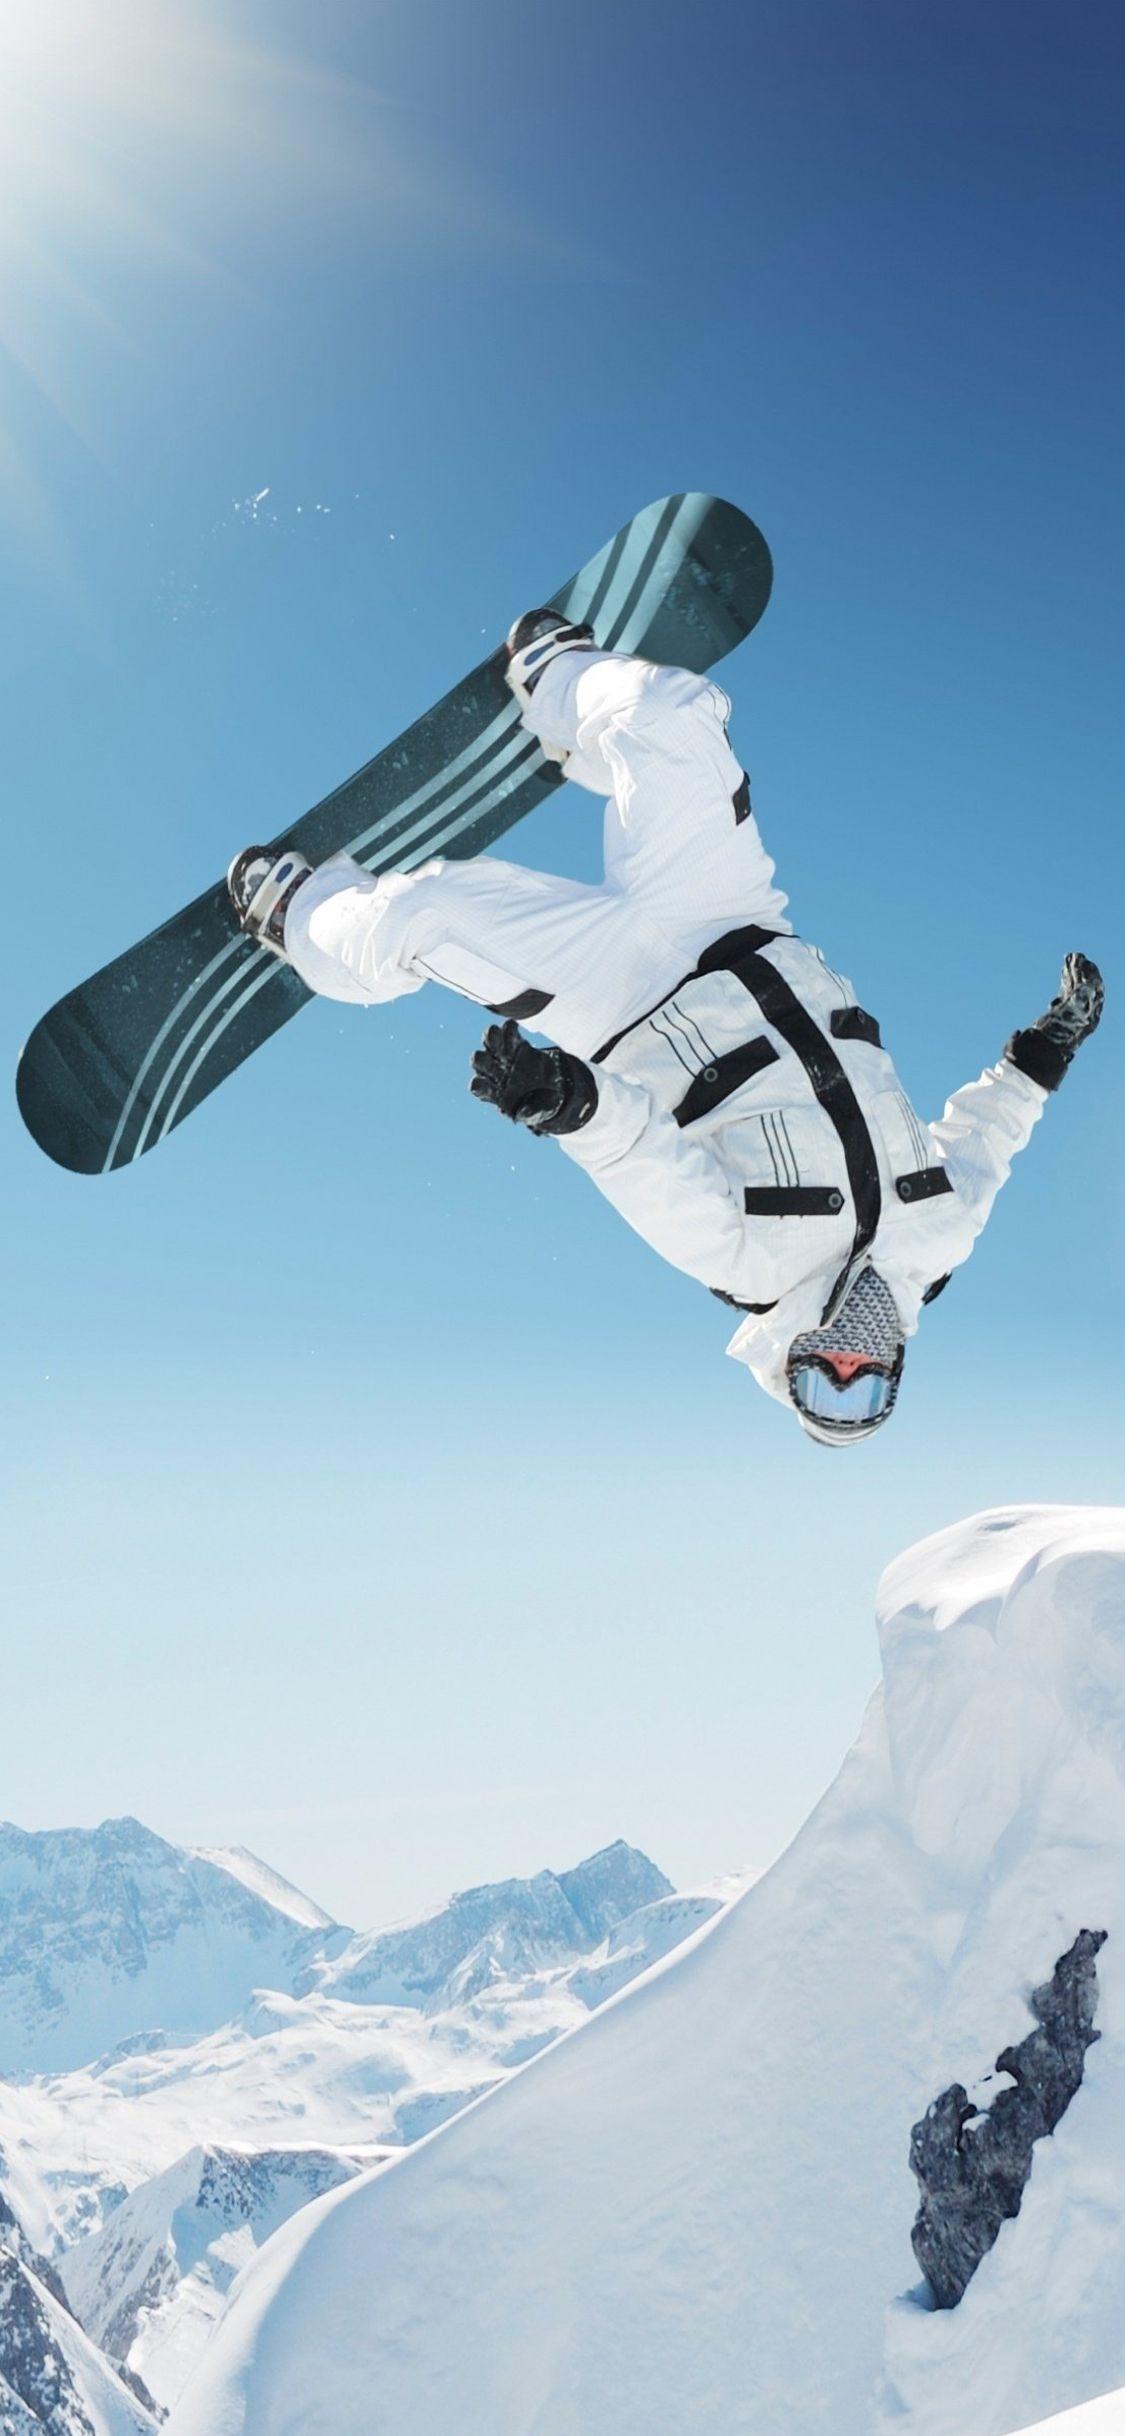 Snowboard iPhone X Wallpaper HD High Resolution 1125 x